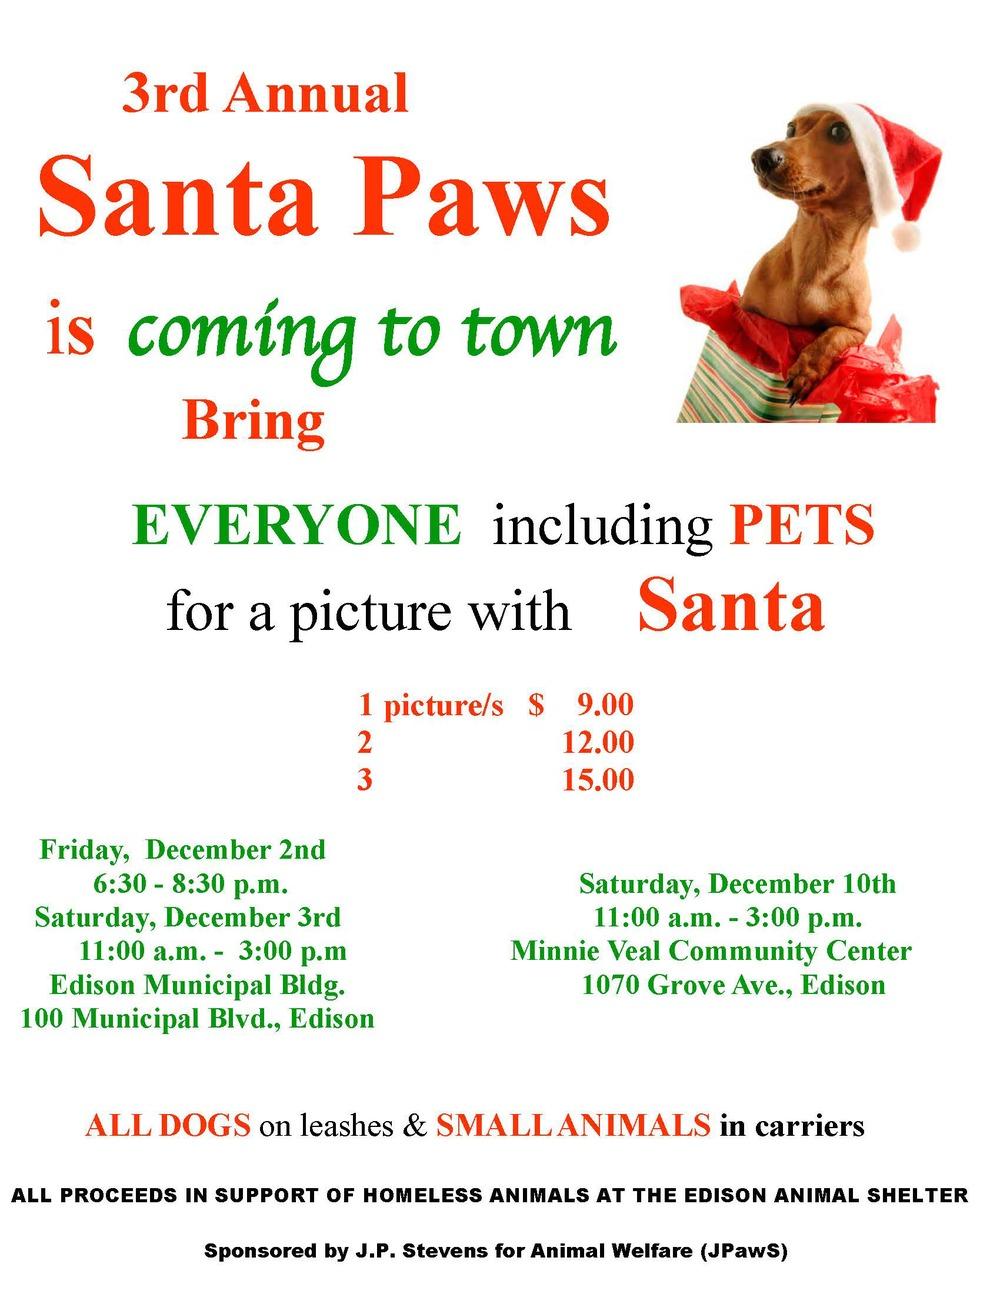 Santa Paws 2011!